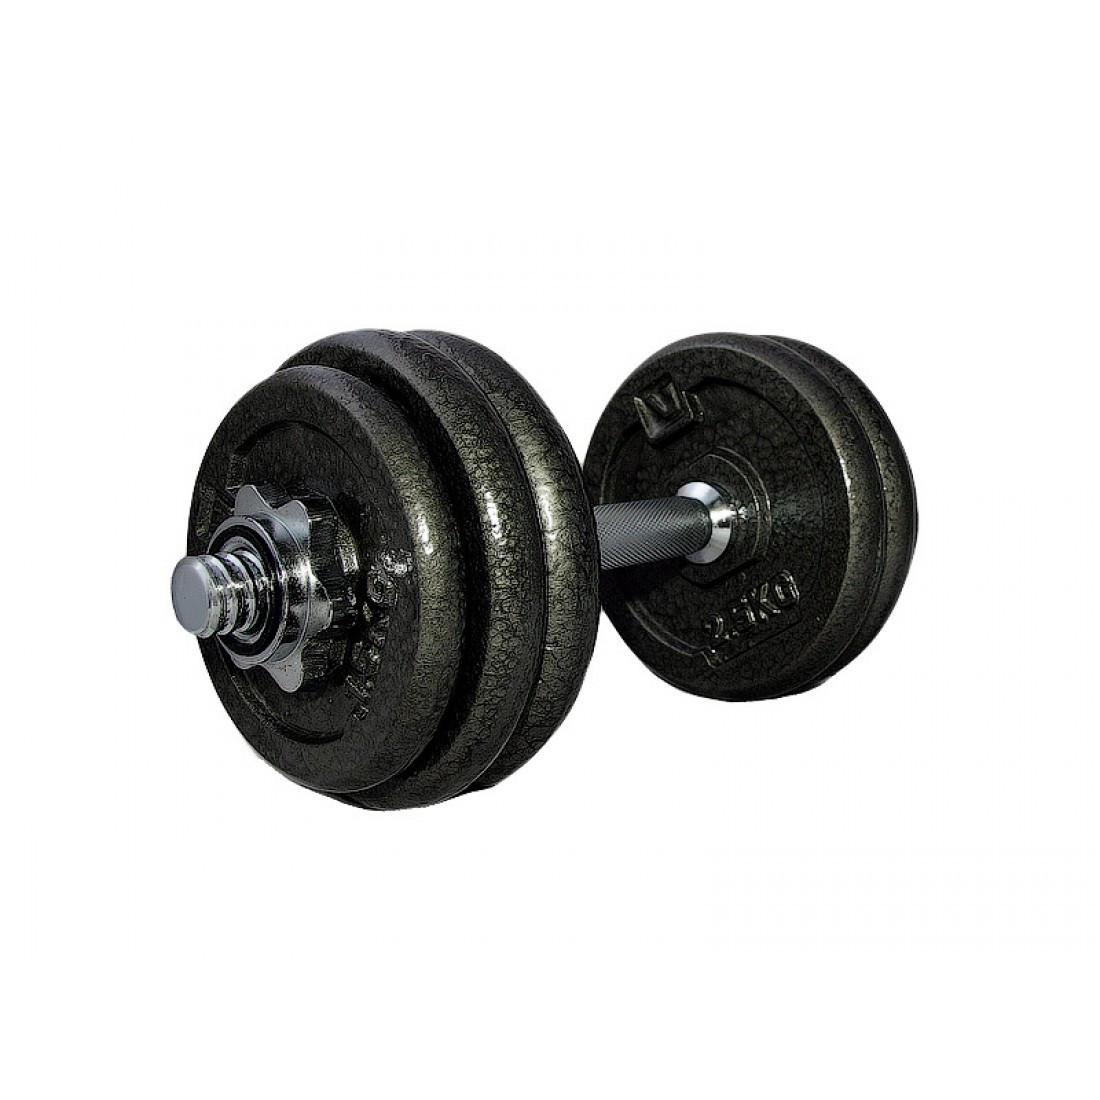 Гантель наборная железная LiveUp DUMBELL SET, 15 кг